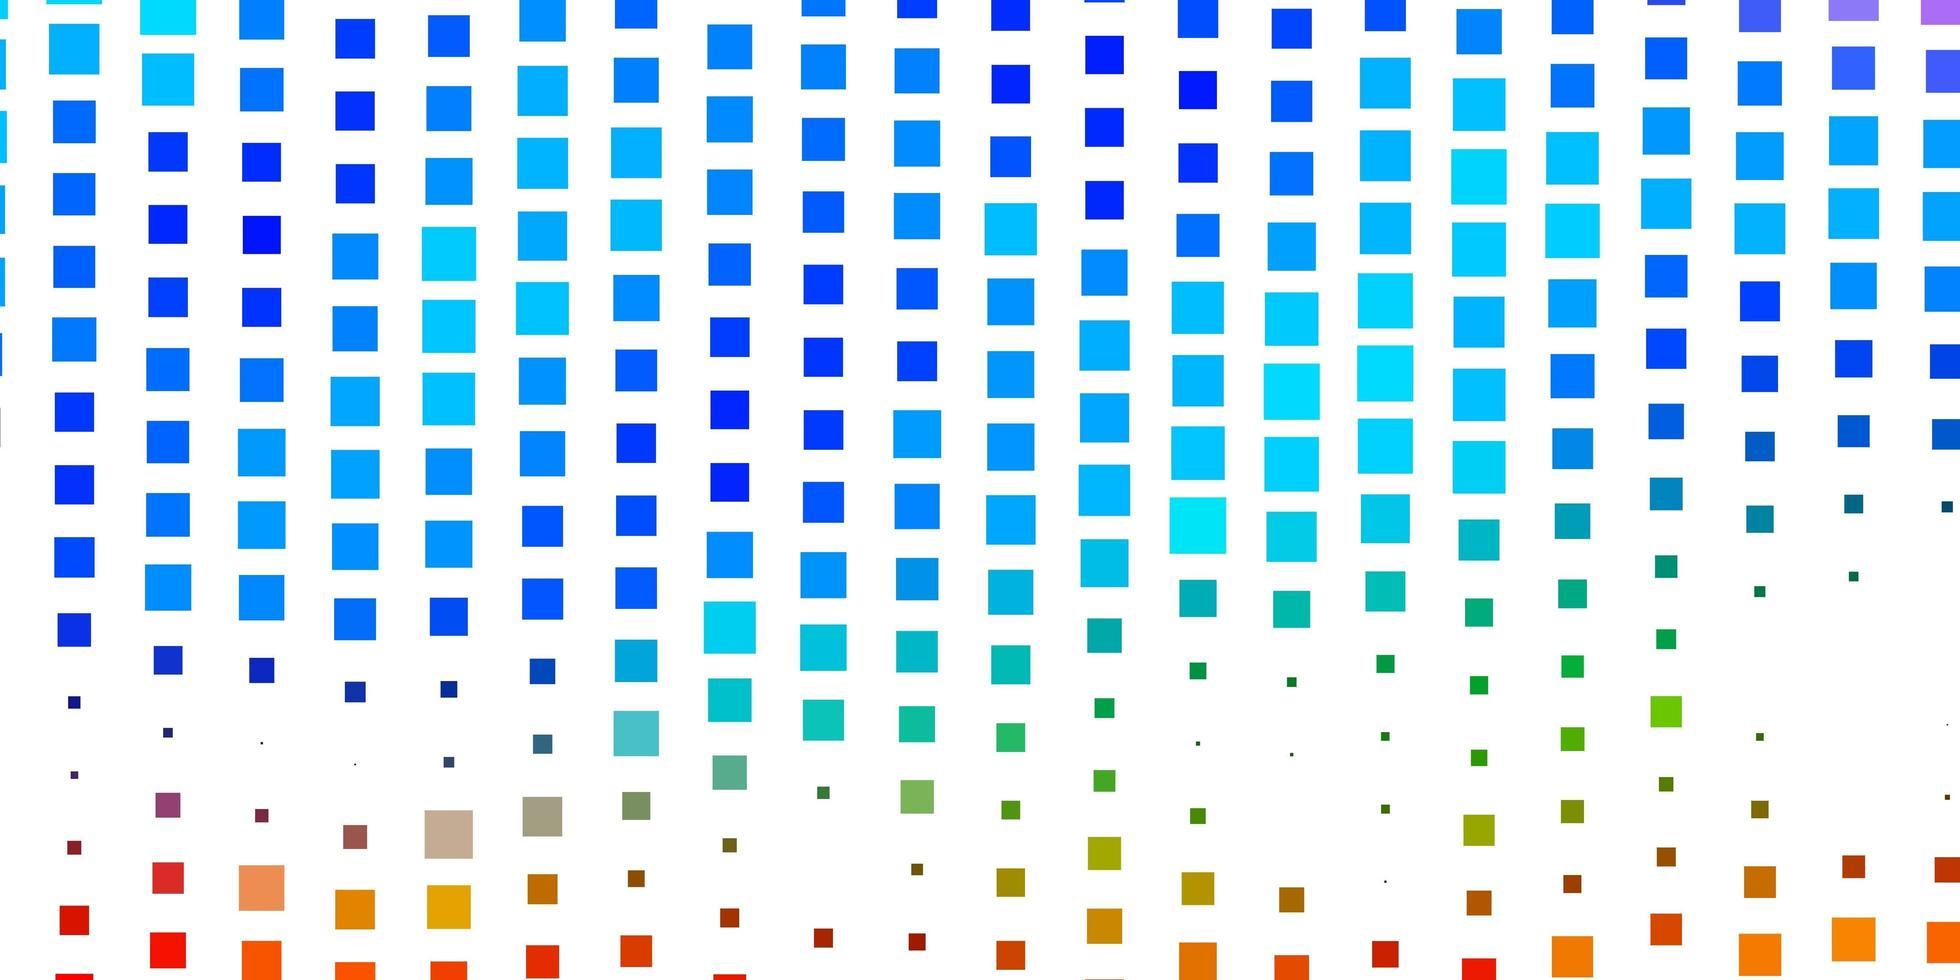 modelo de vetor multicolorido escuro em retângulos.